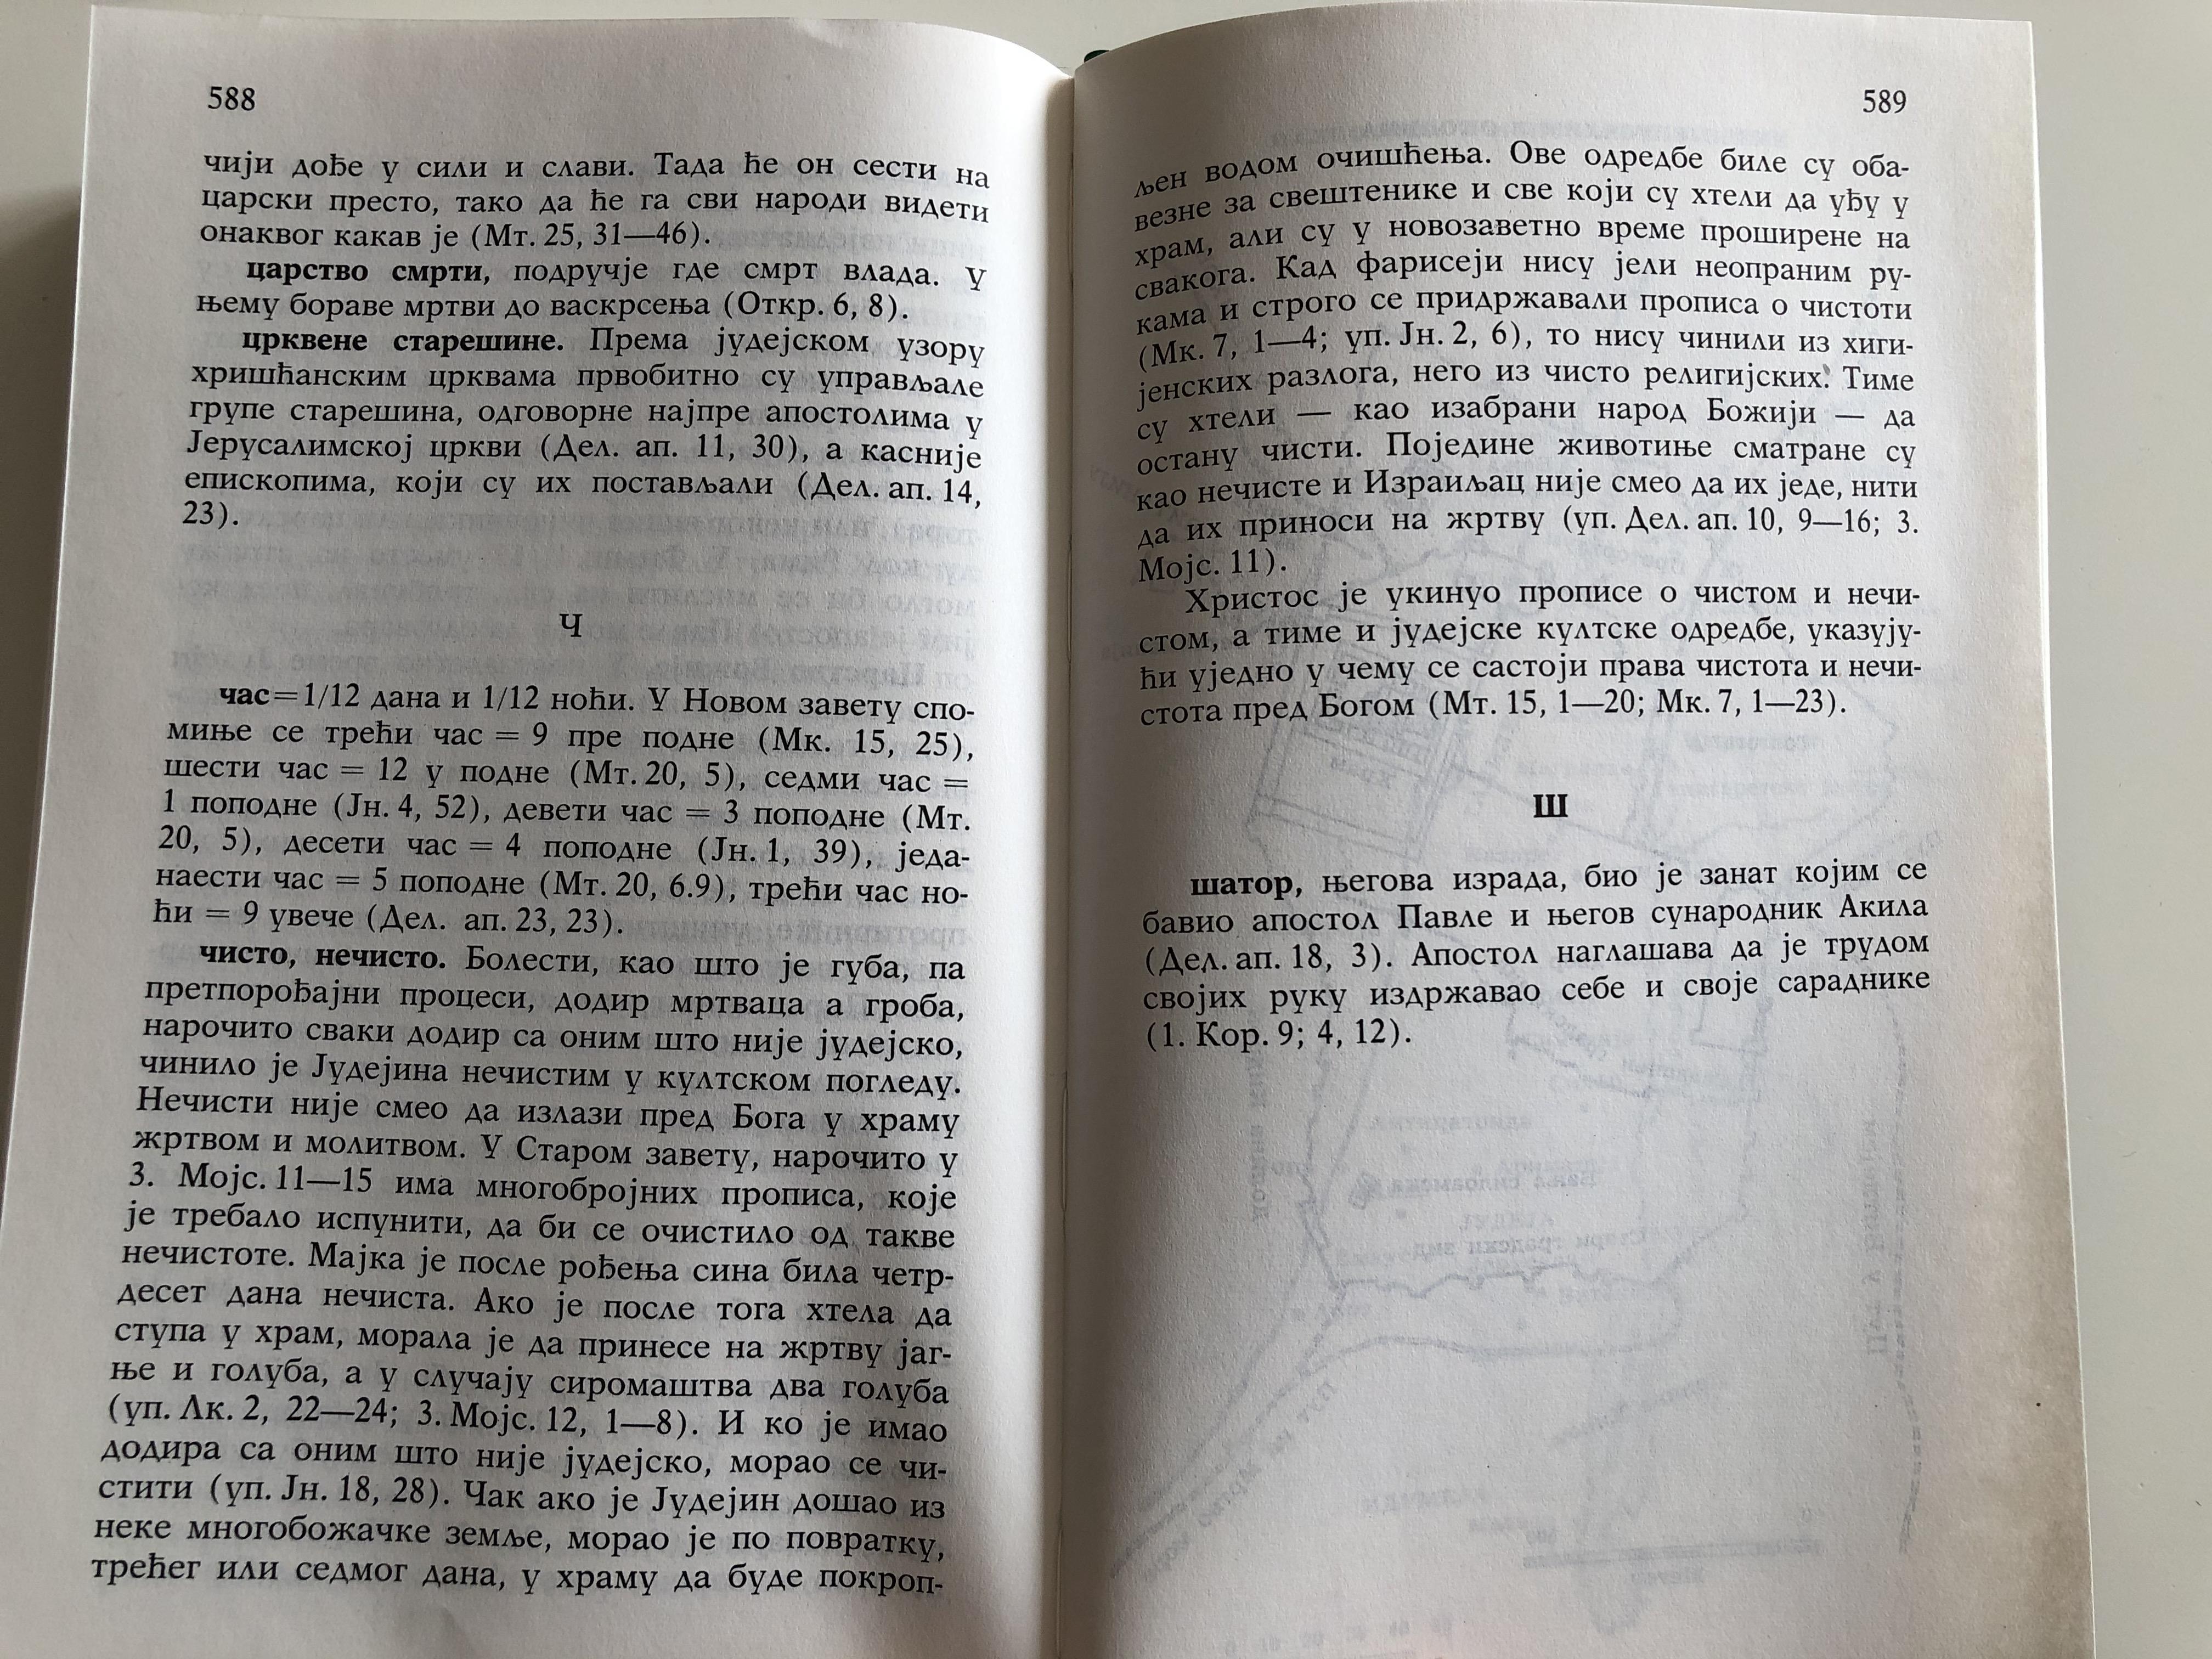 serbian-new-testament-novi-zavet-emilijan-m.-arni-16.jpg